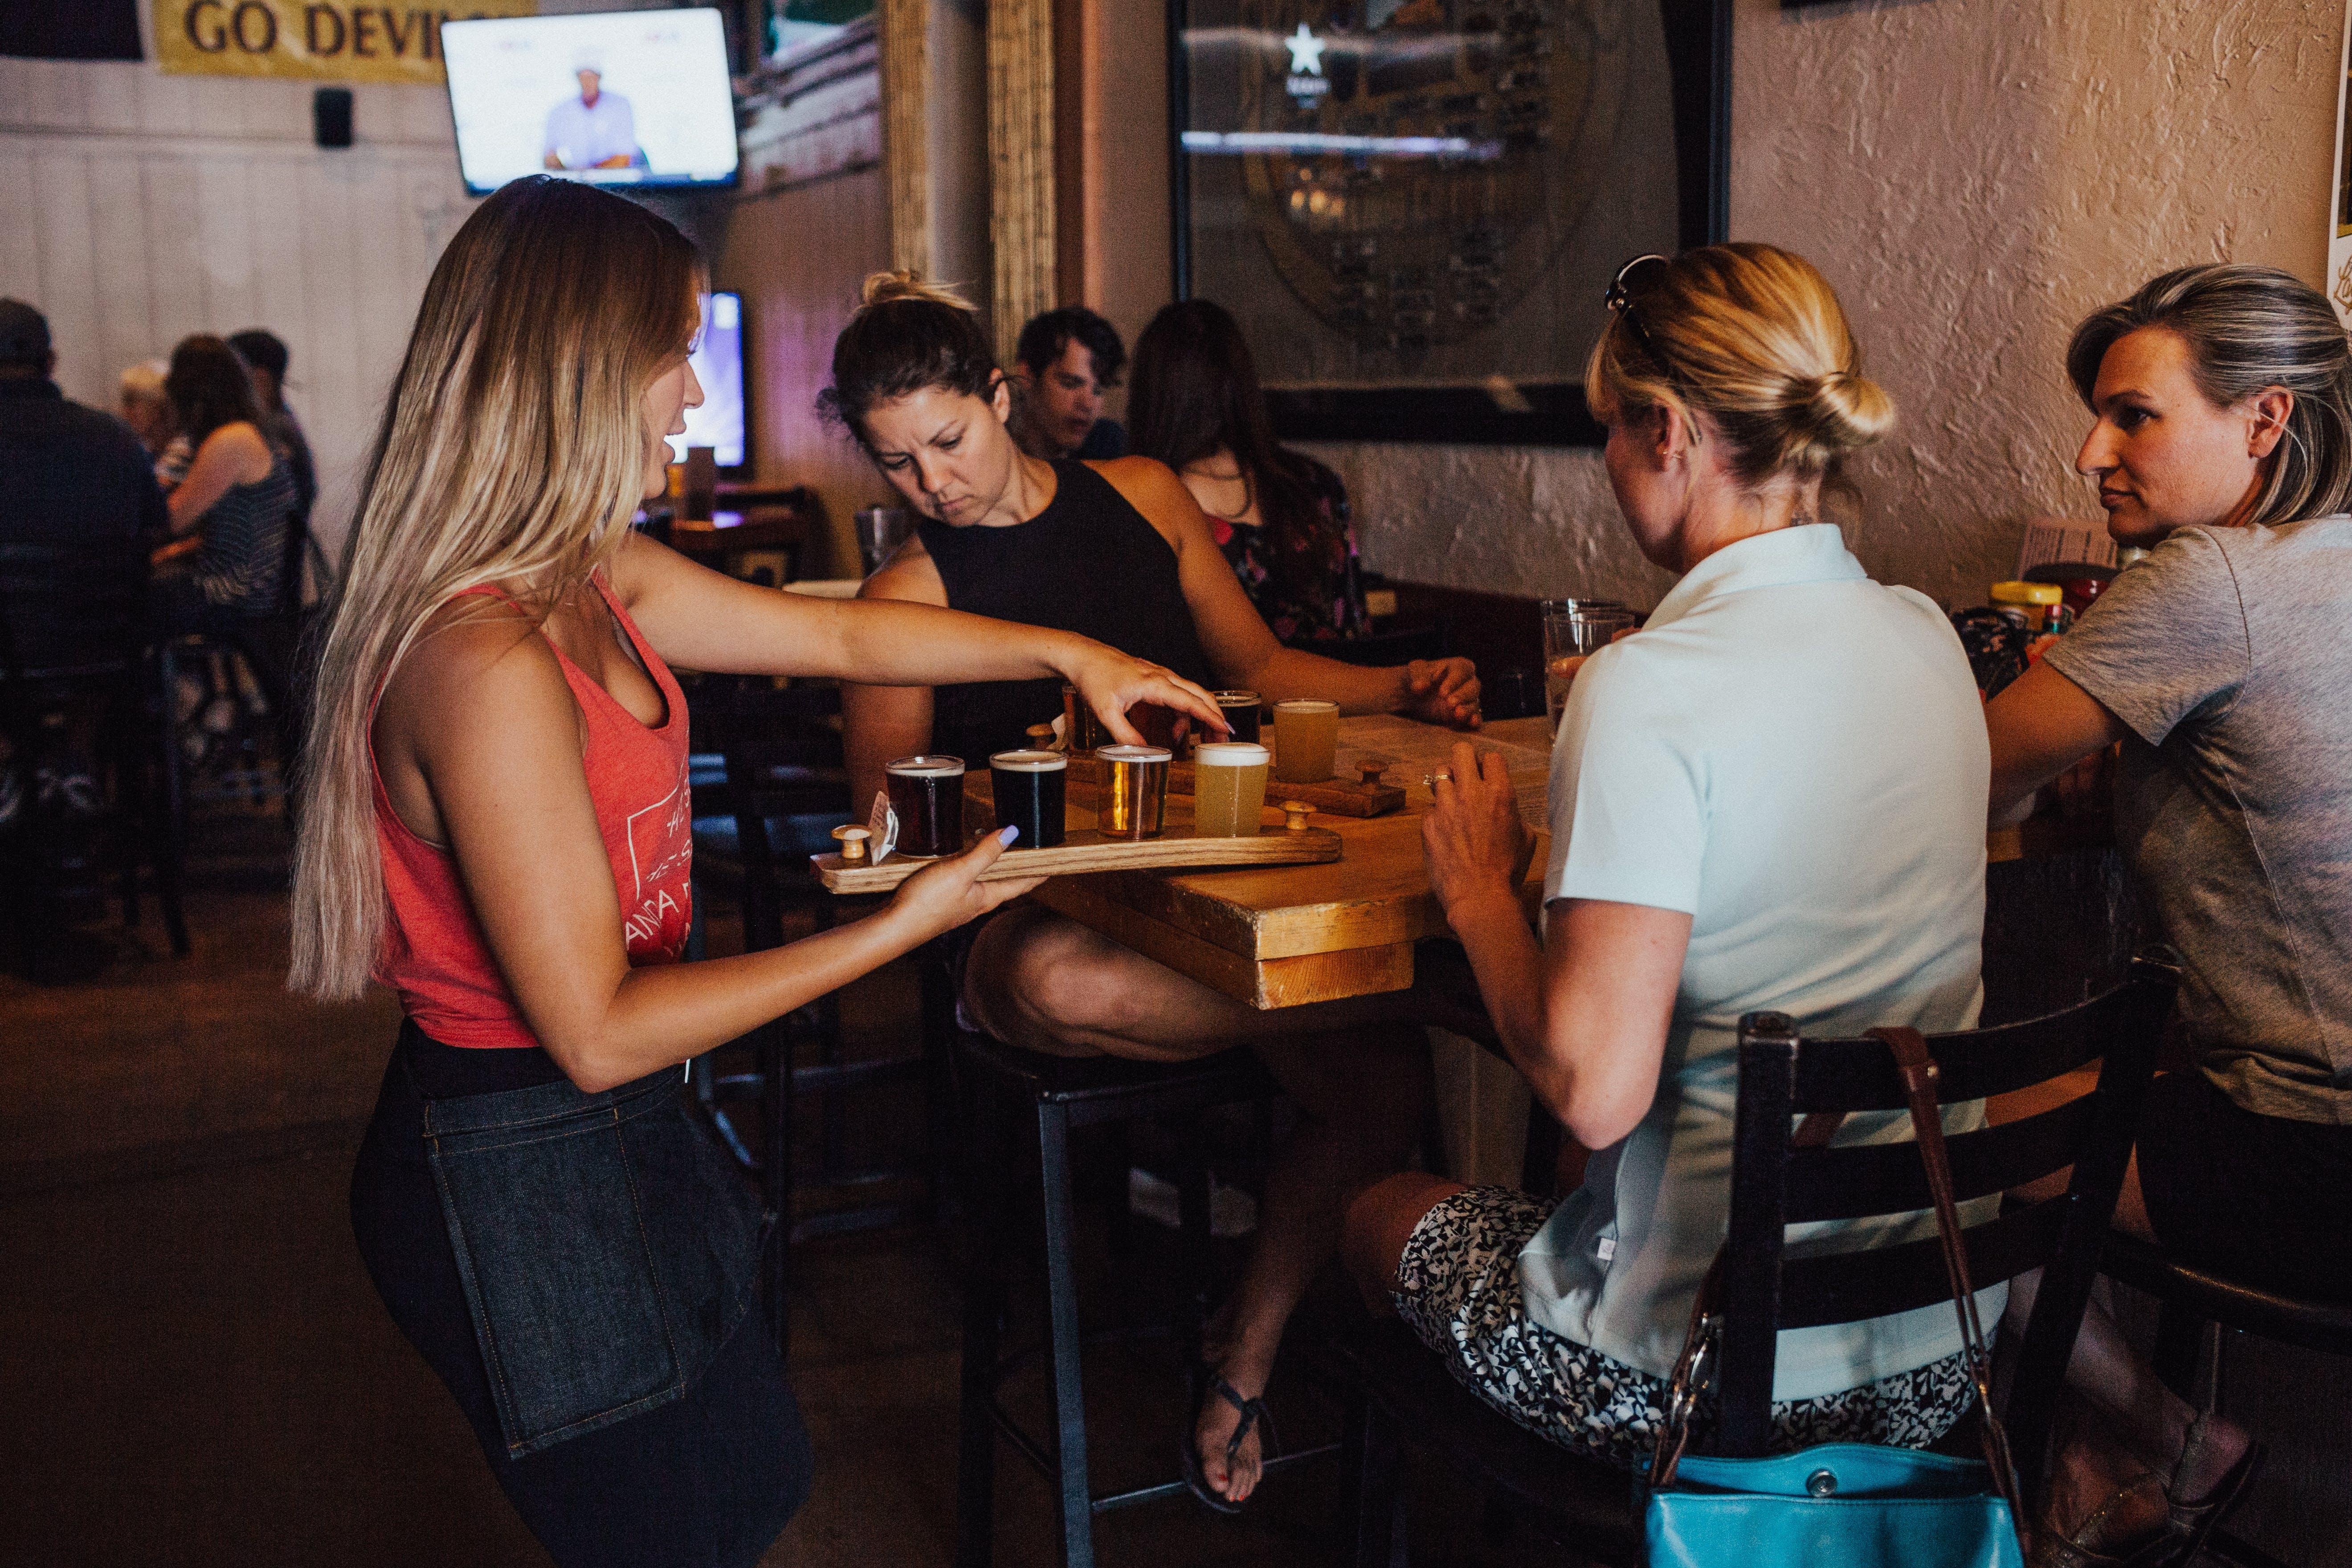 Woman Serving Drinks on Women Sitting Inside an Establishment